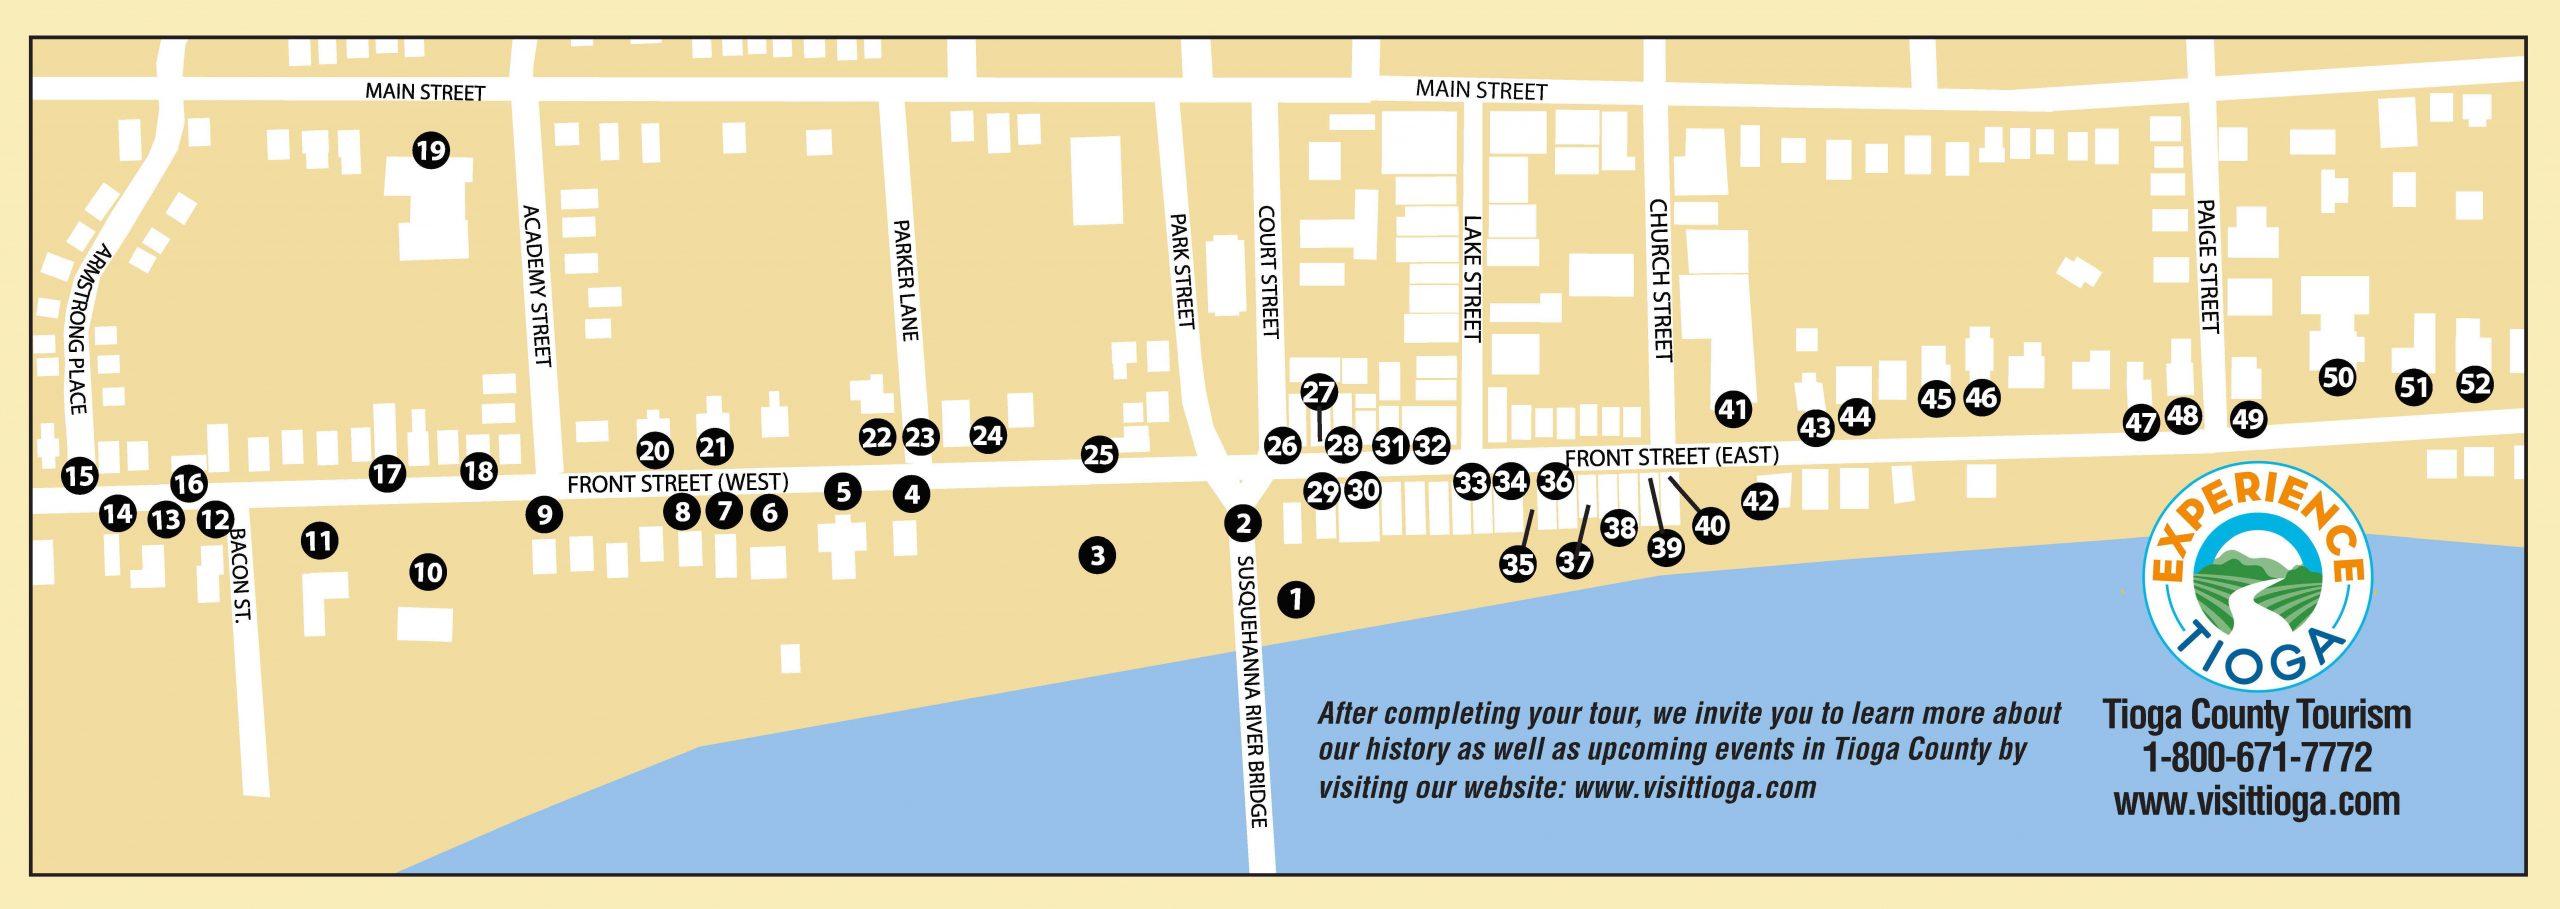 Historic Owego Walking Tour Brochure Map